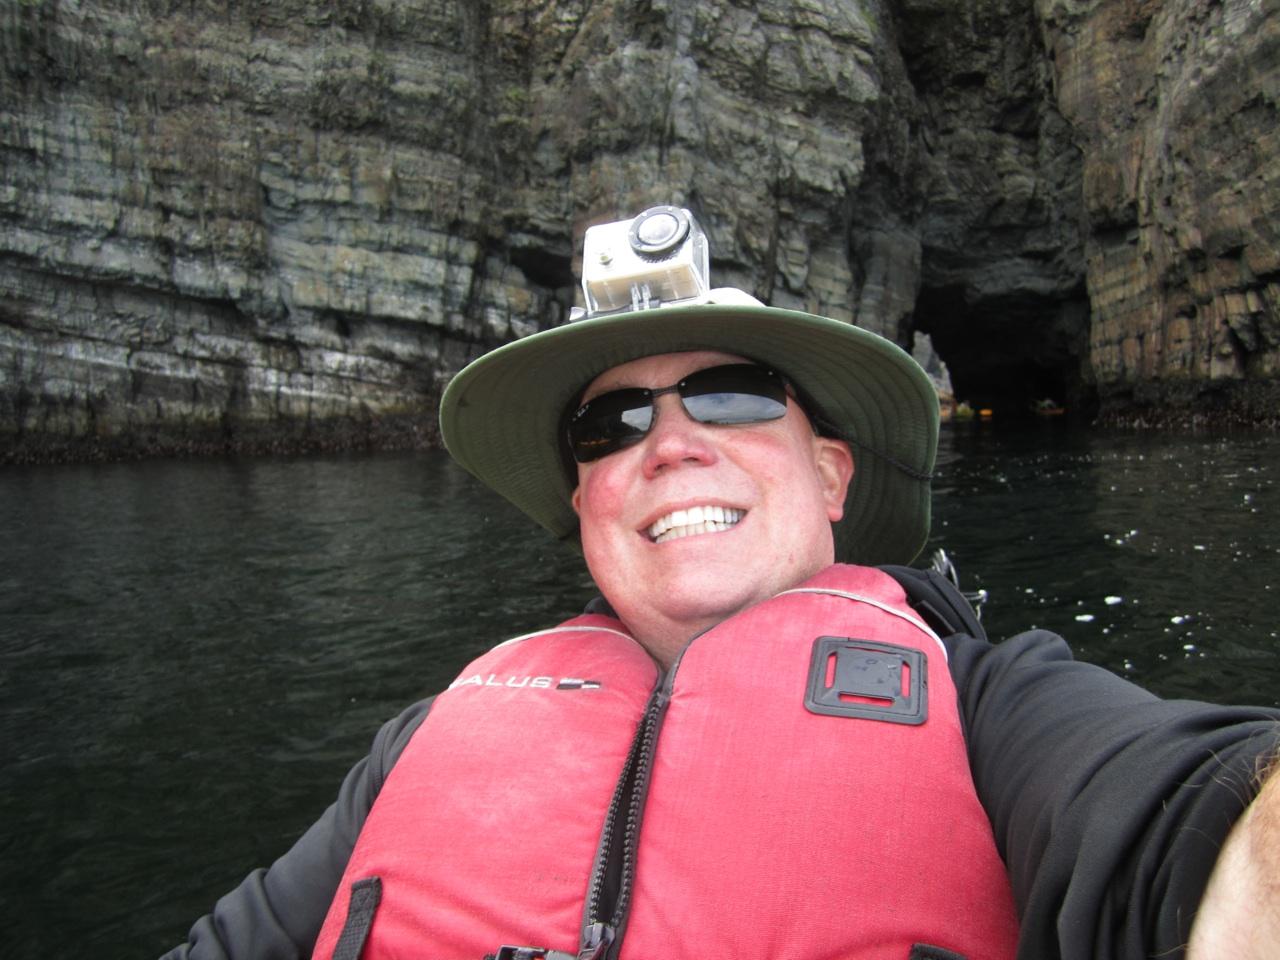 David's Self Portrait, In The Back Of The Kayak